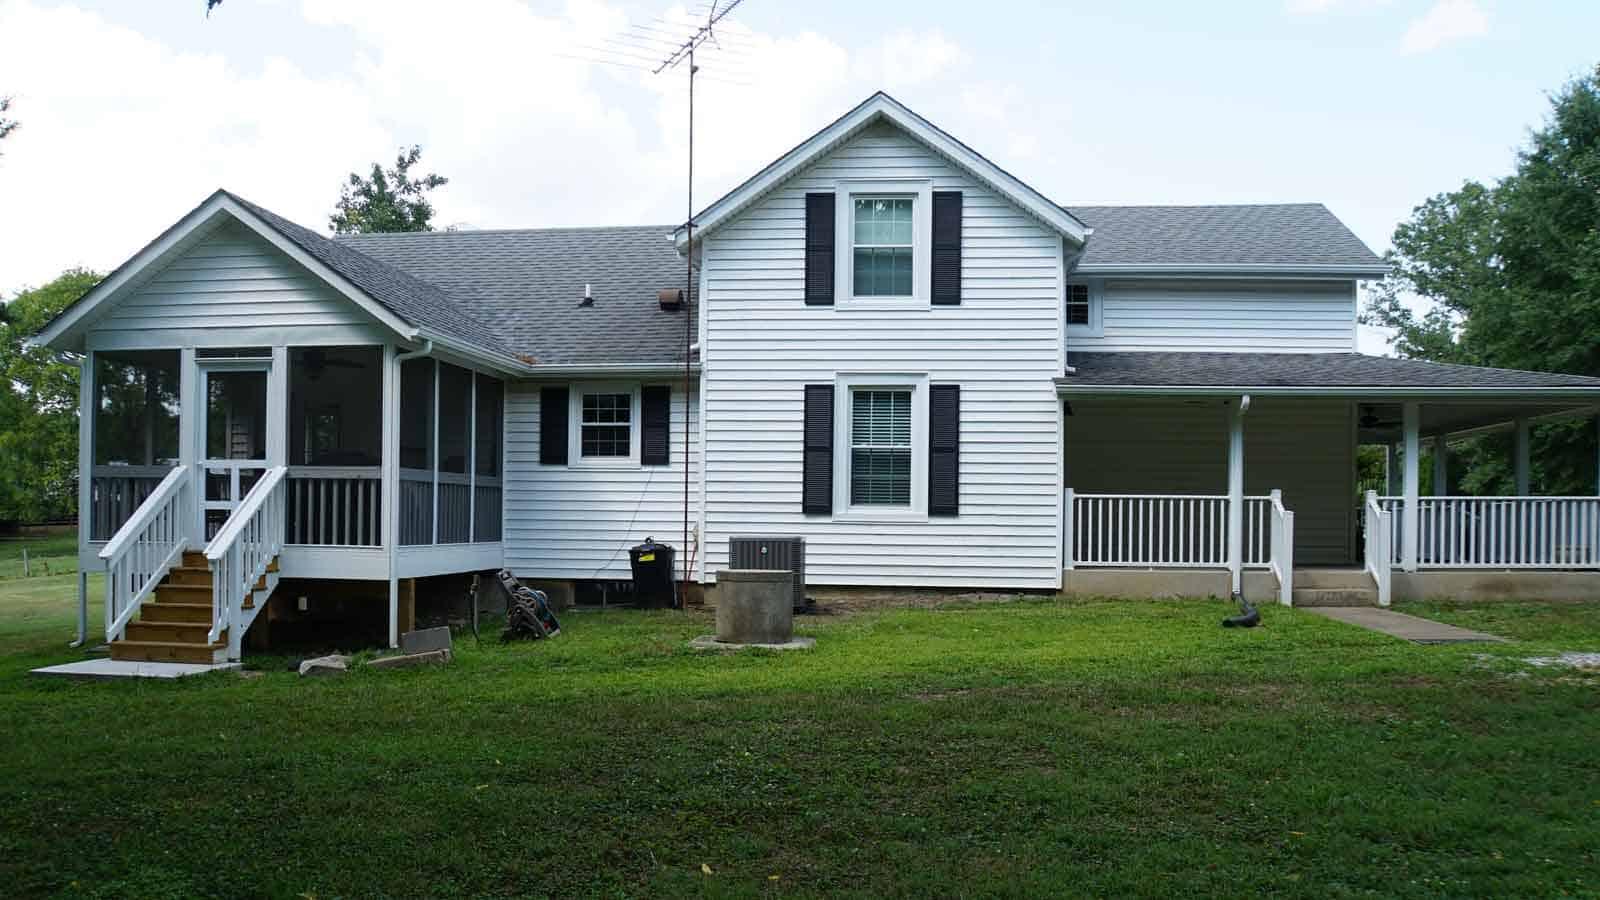 Whole house renovation by Milton Construction Company